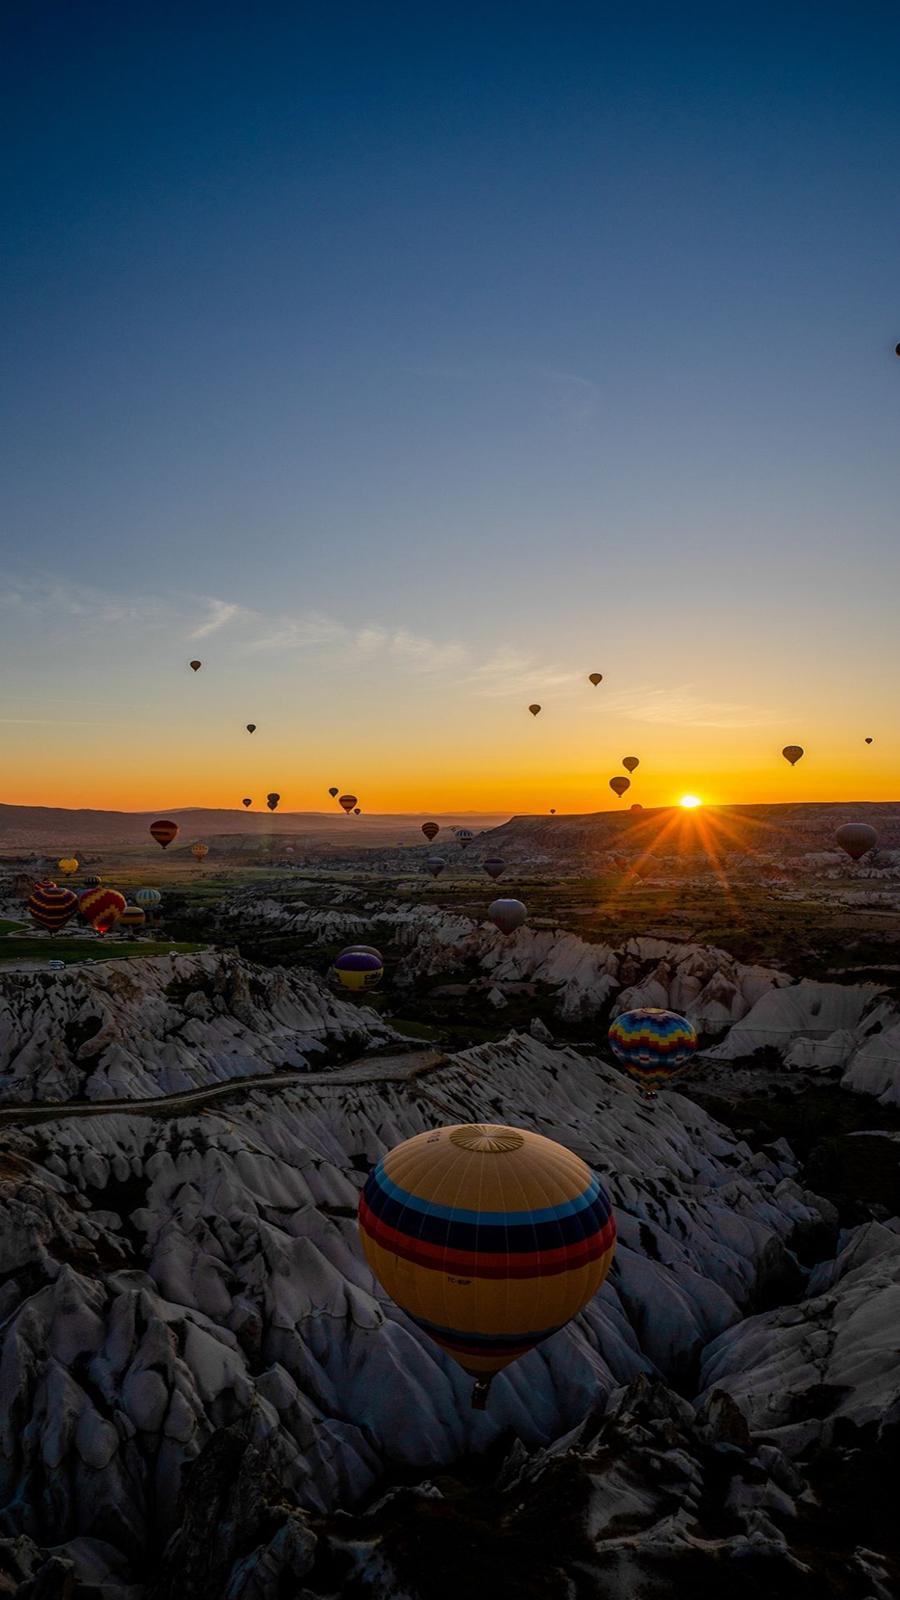 Kapadokya Wallpapers – Turkey Nature Wallpapers Free Download